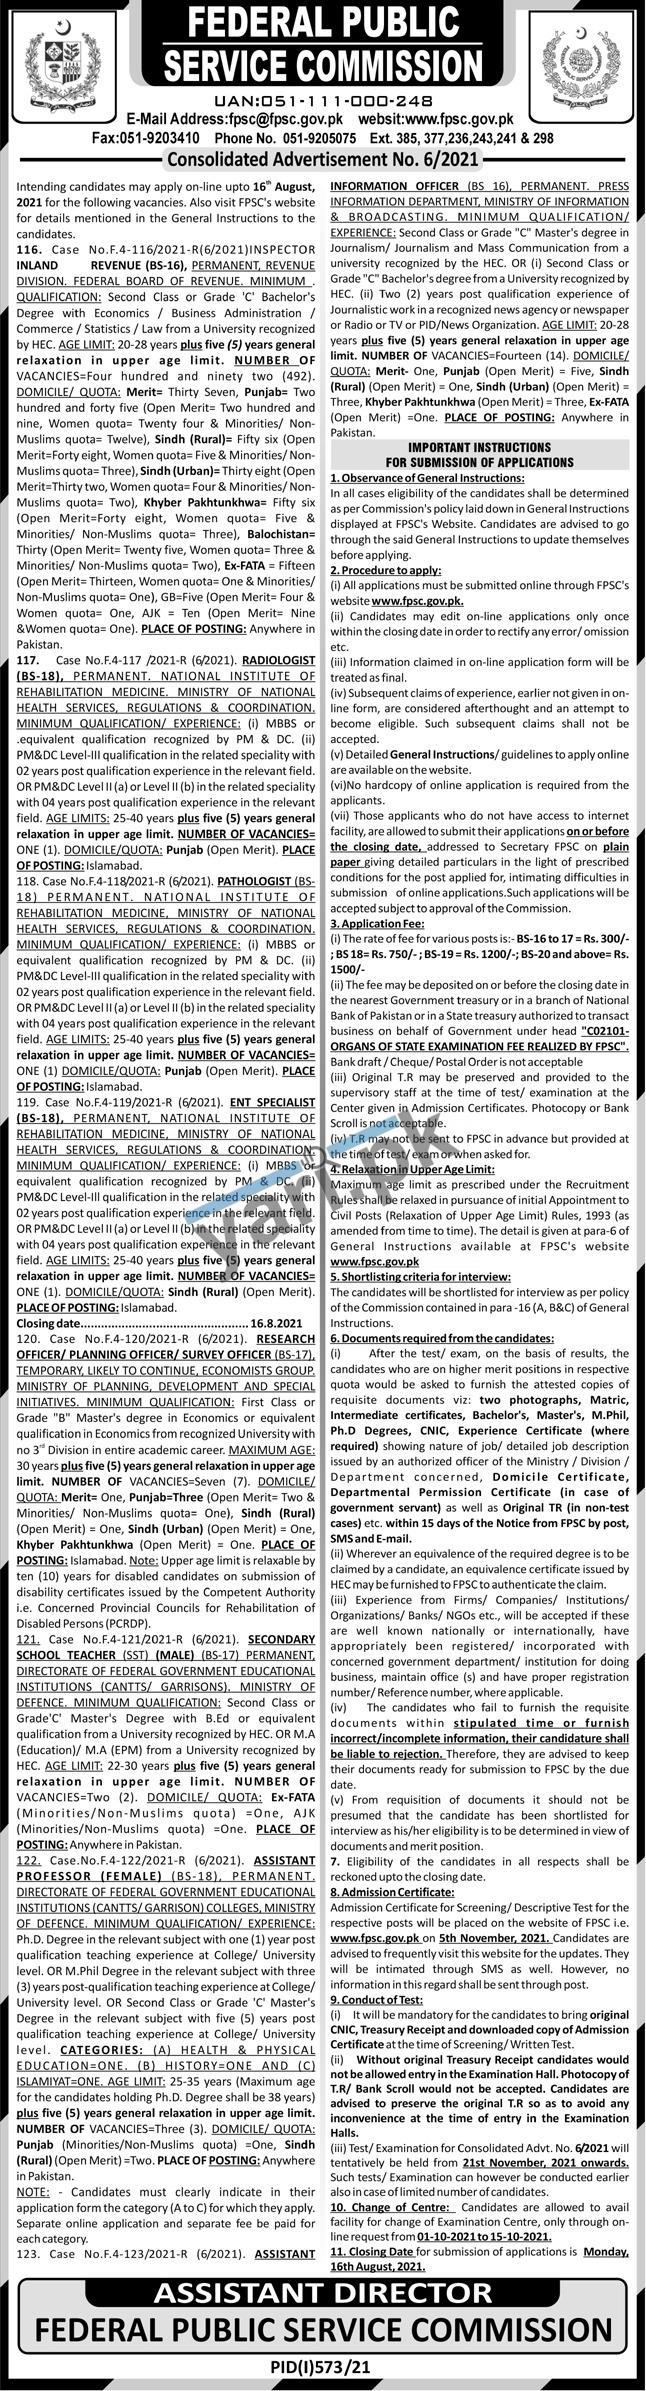 FPSC Federal Public Service Commission Jobs